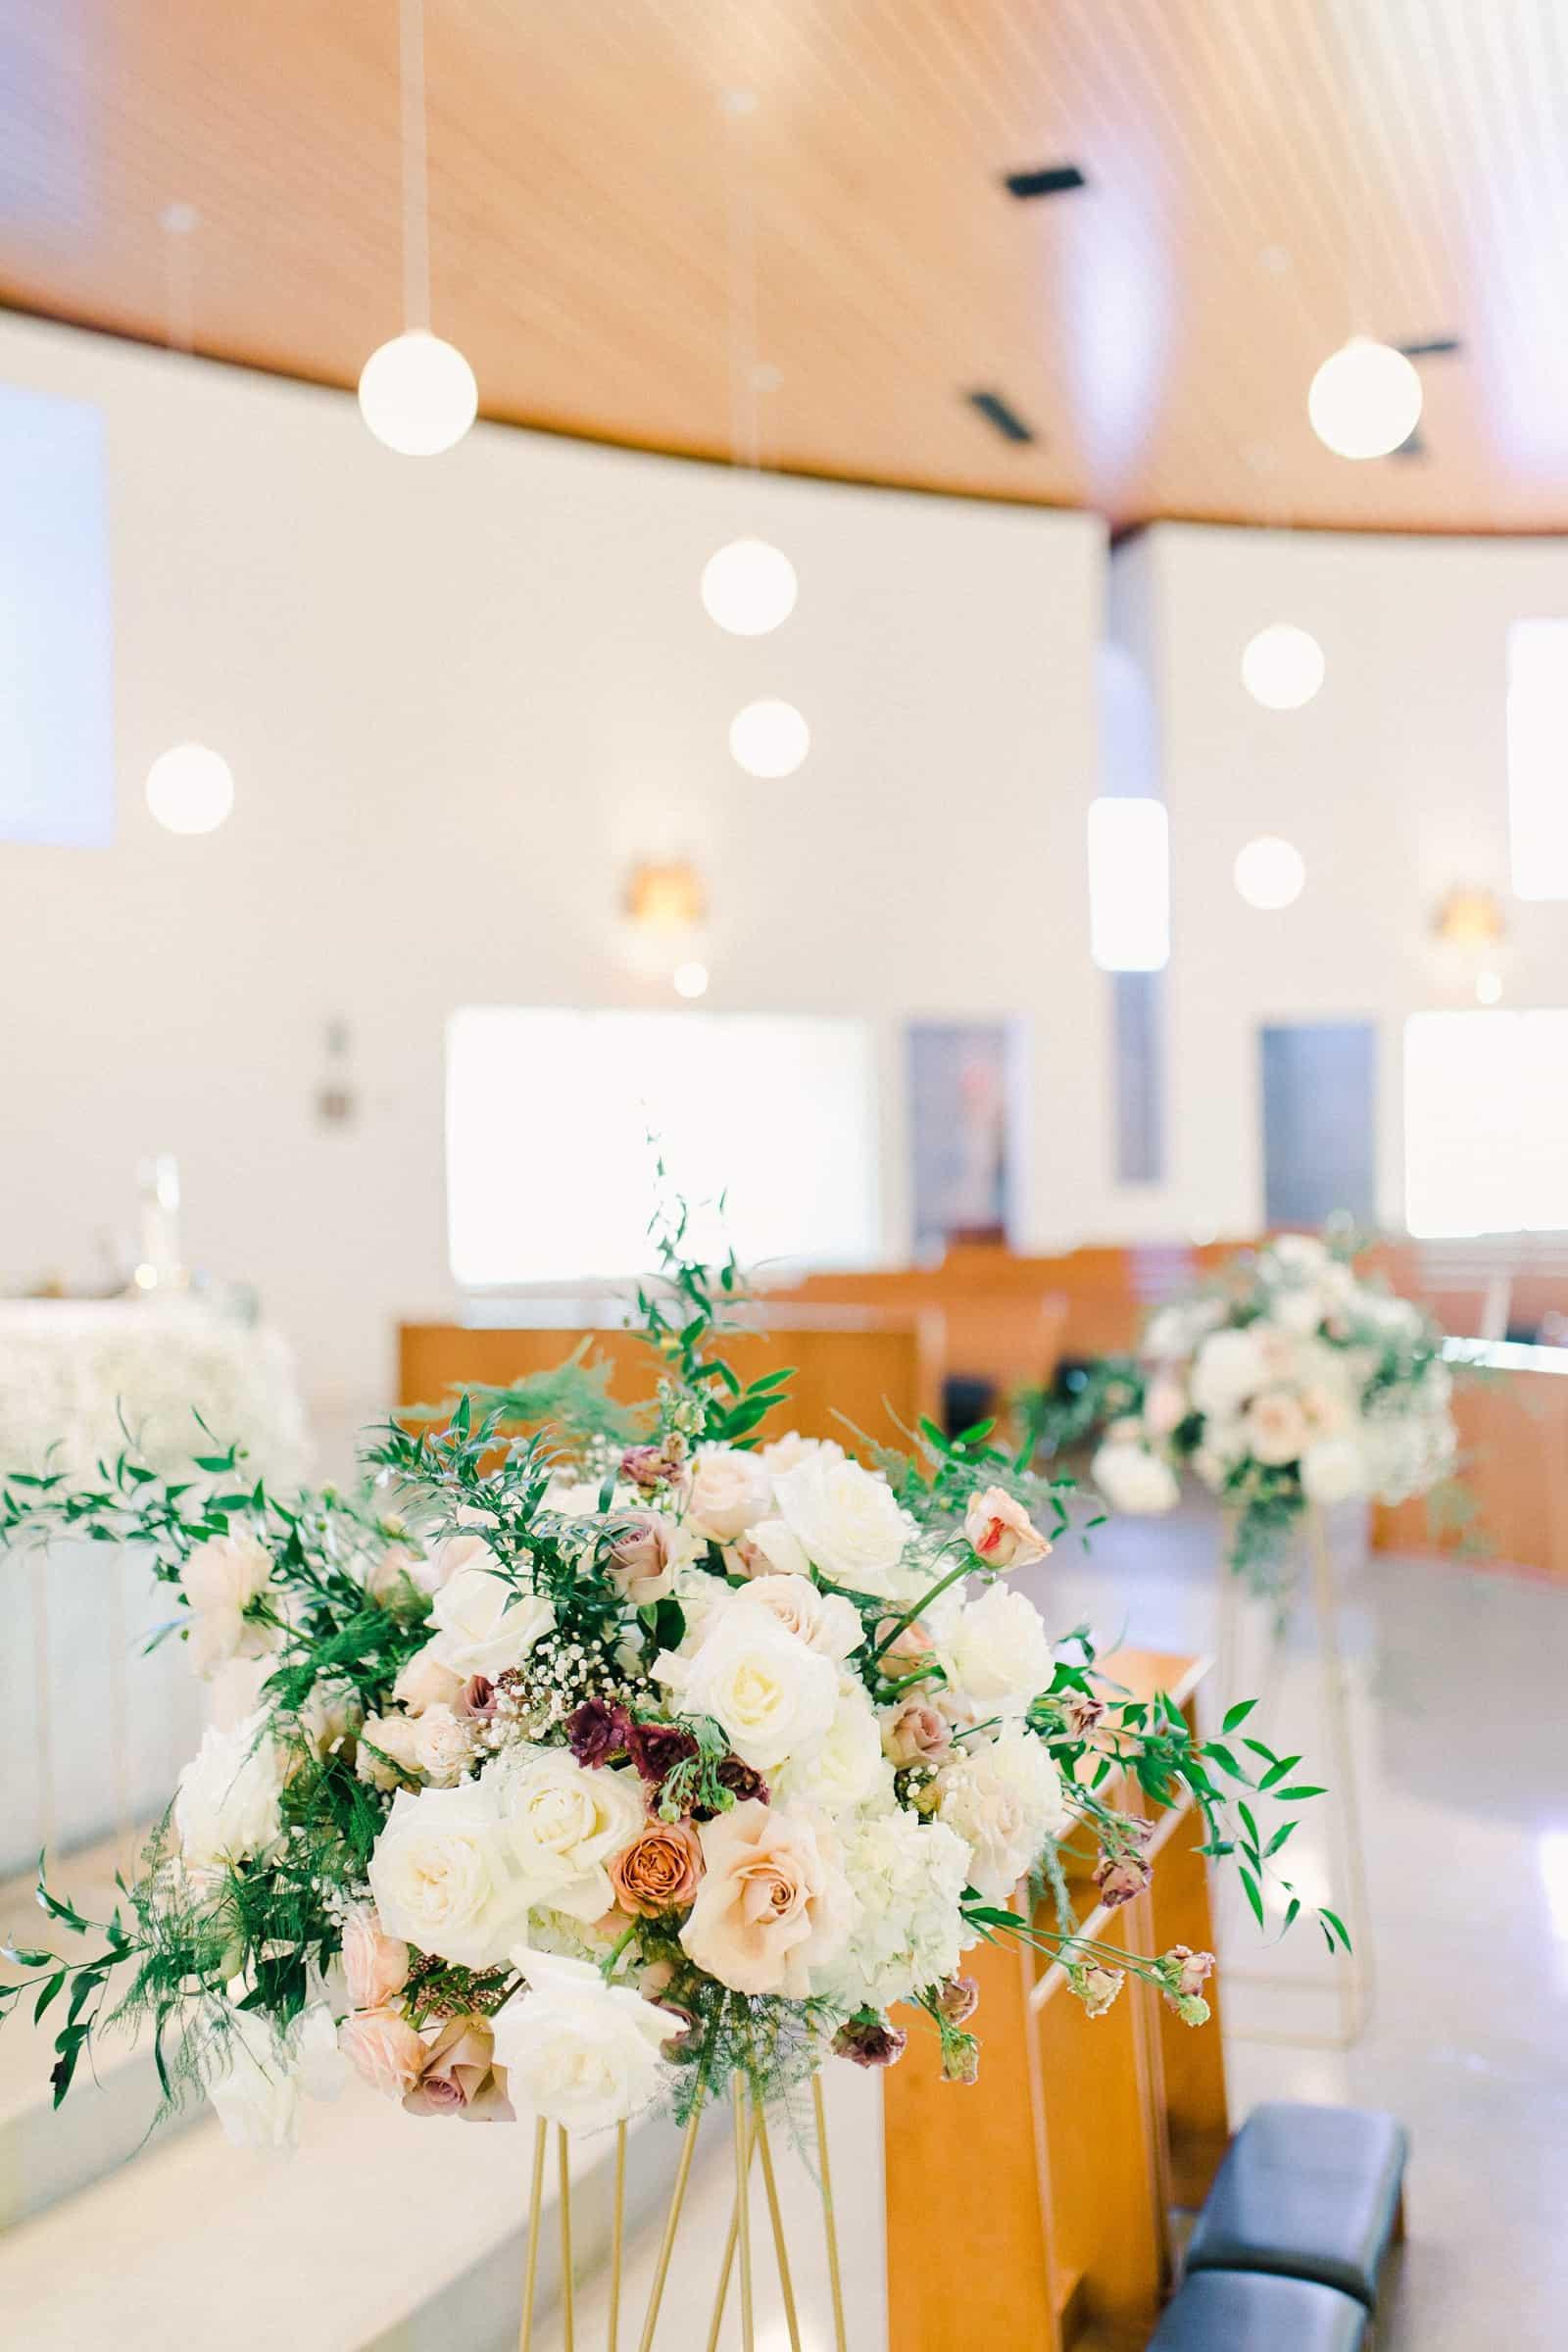 Church wedding with rose centerpieces arrangements